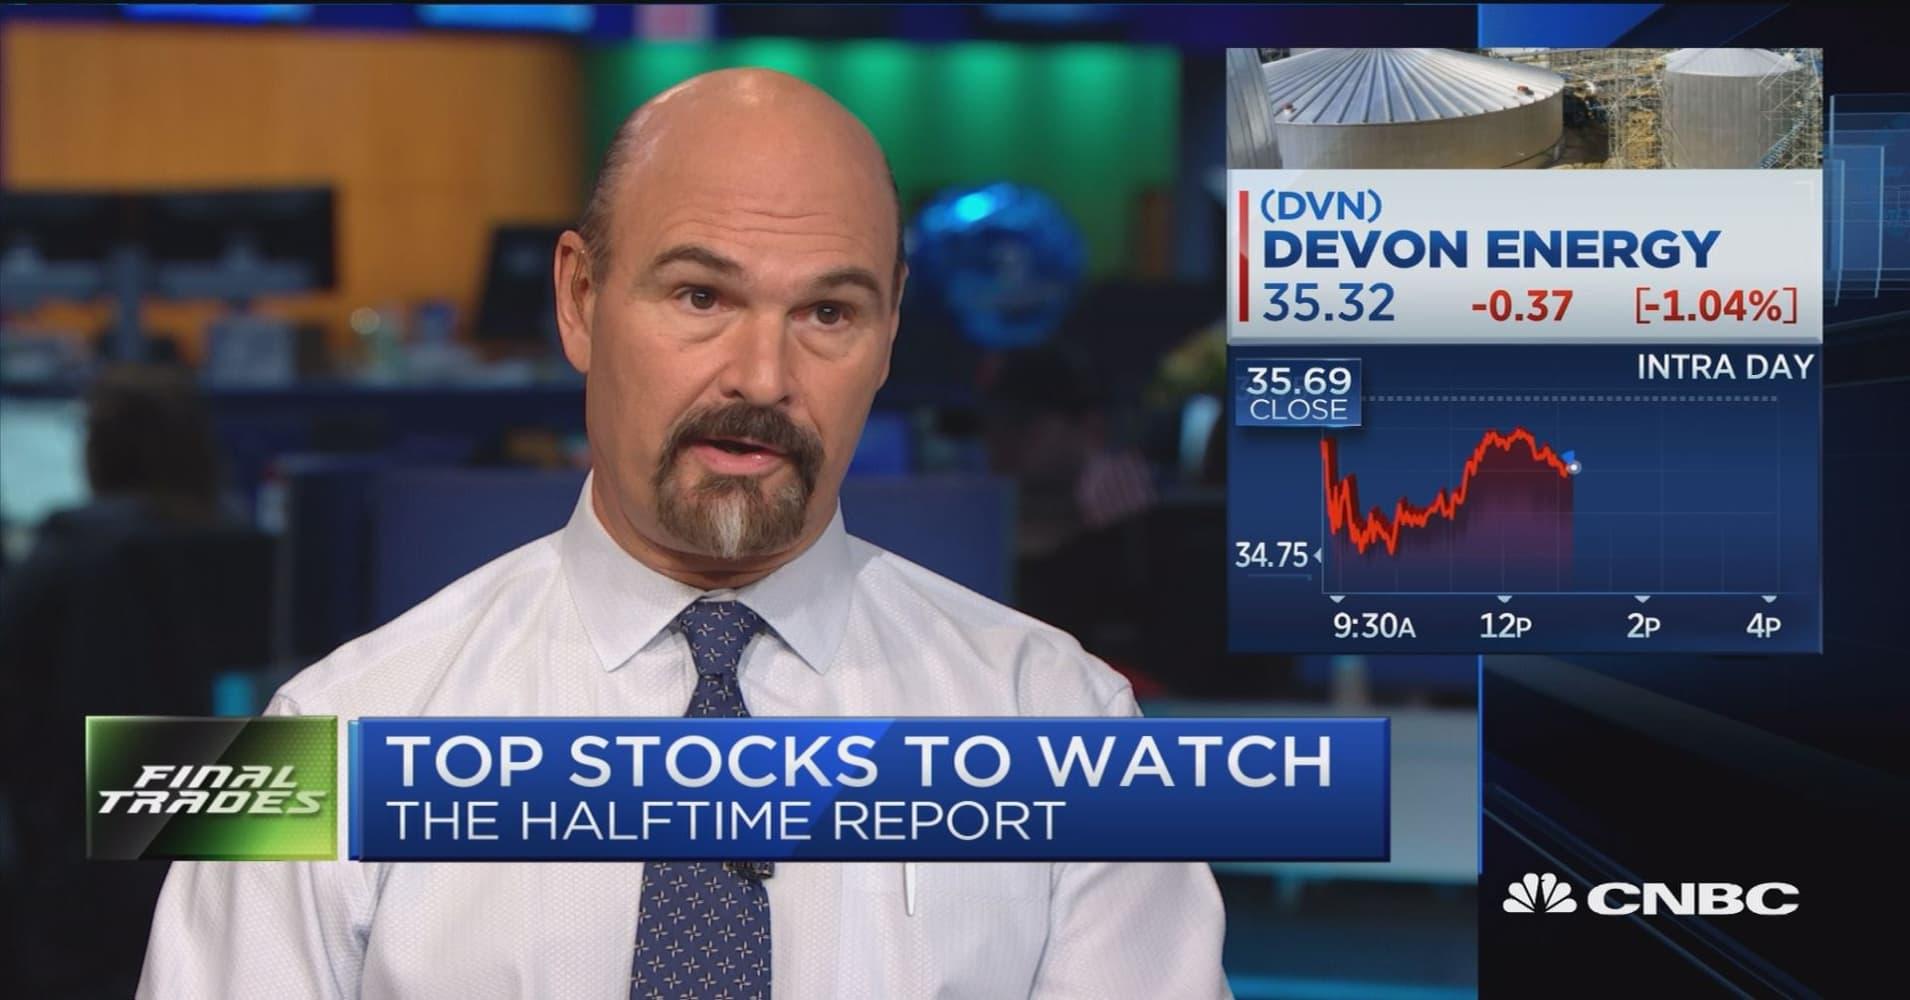 Honeywell, Devon Energy, Store Capital and Bank of America